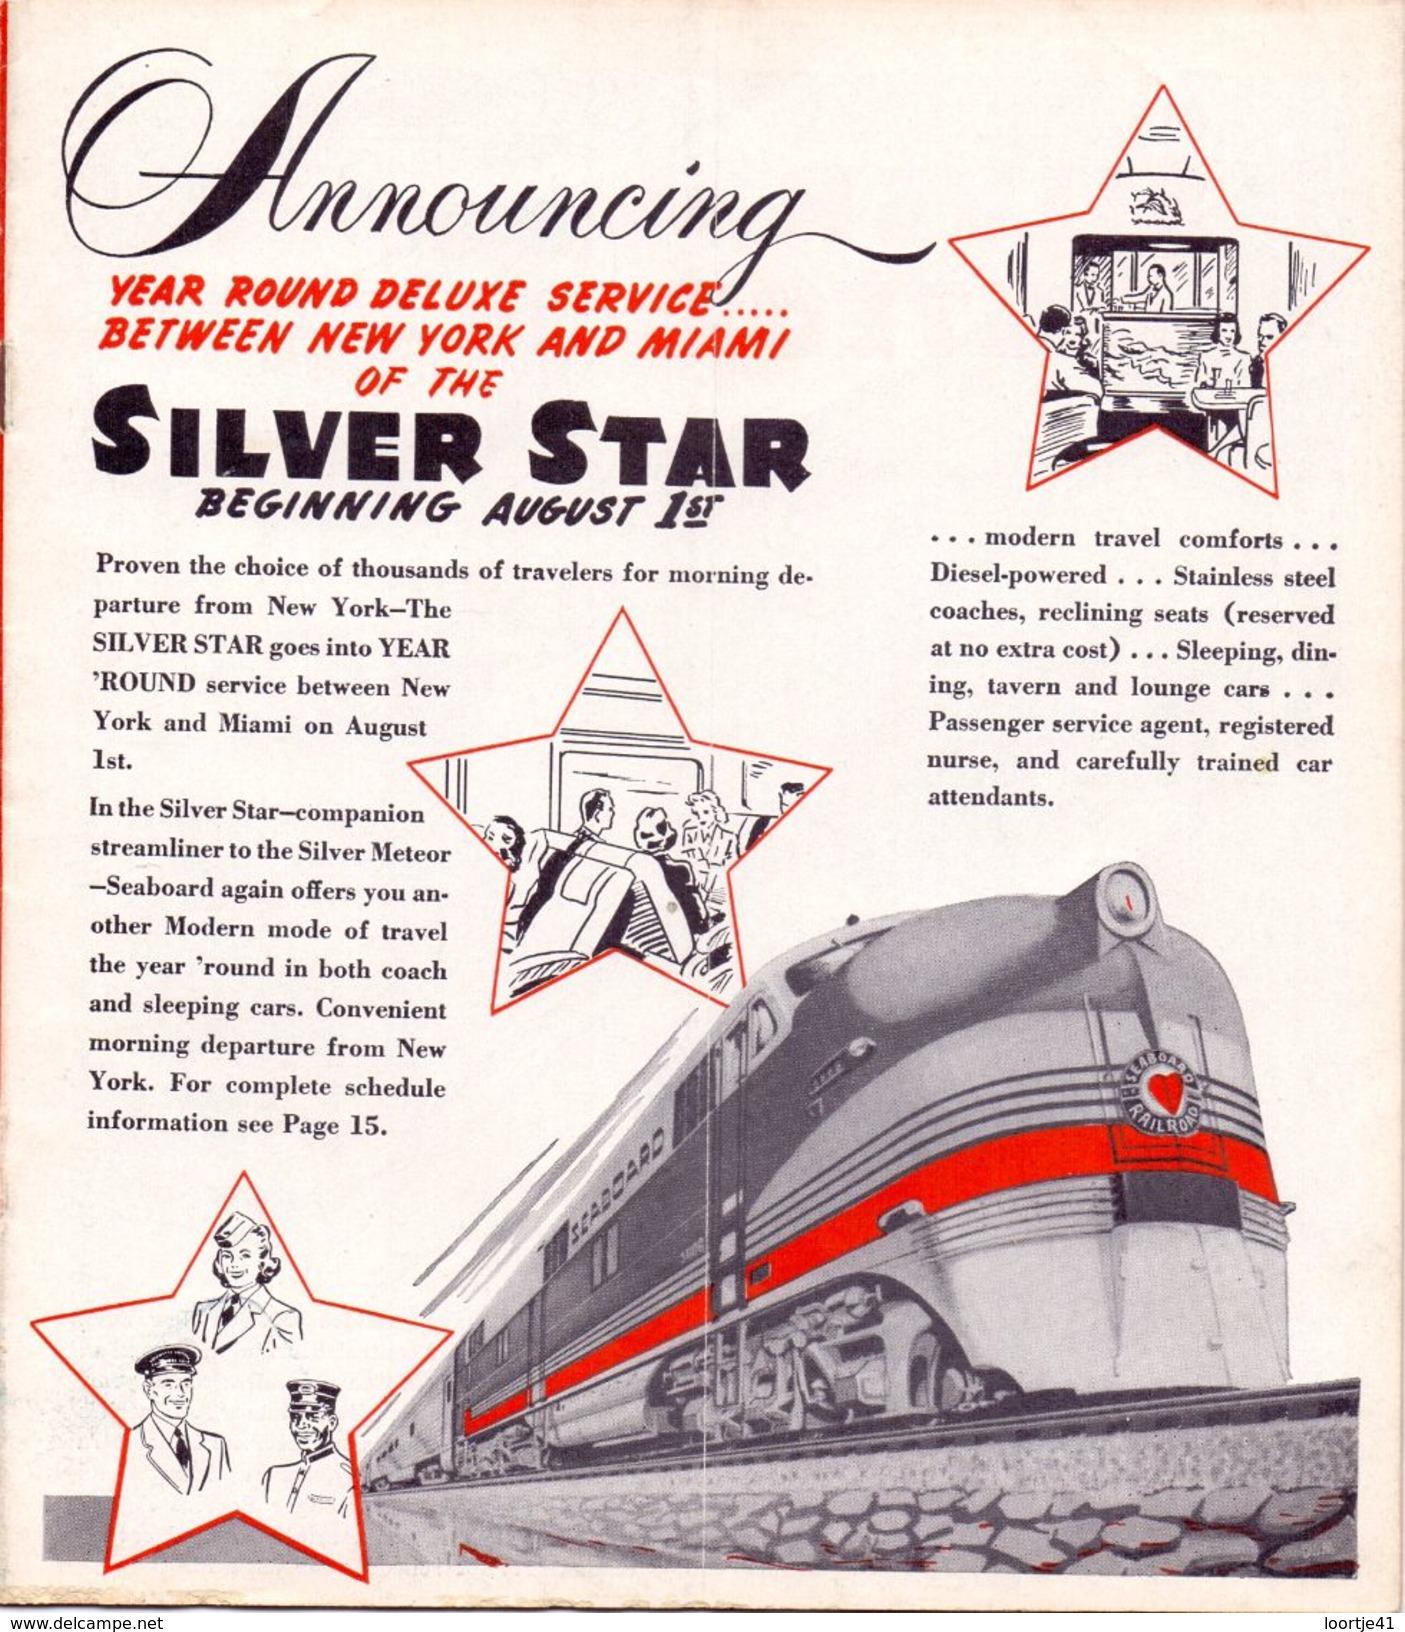 Tourisme - Timetables Schedules Dienstregeling  - Trains Treinen Seaboard Air Line Railroad Time Tables 1948 - World